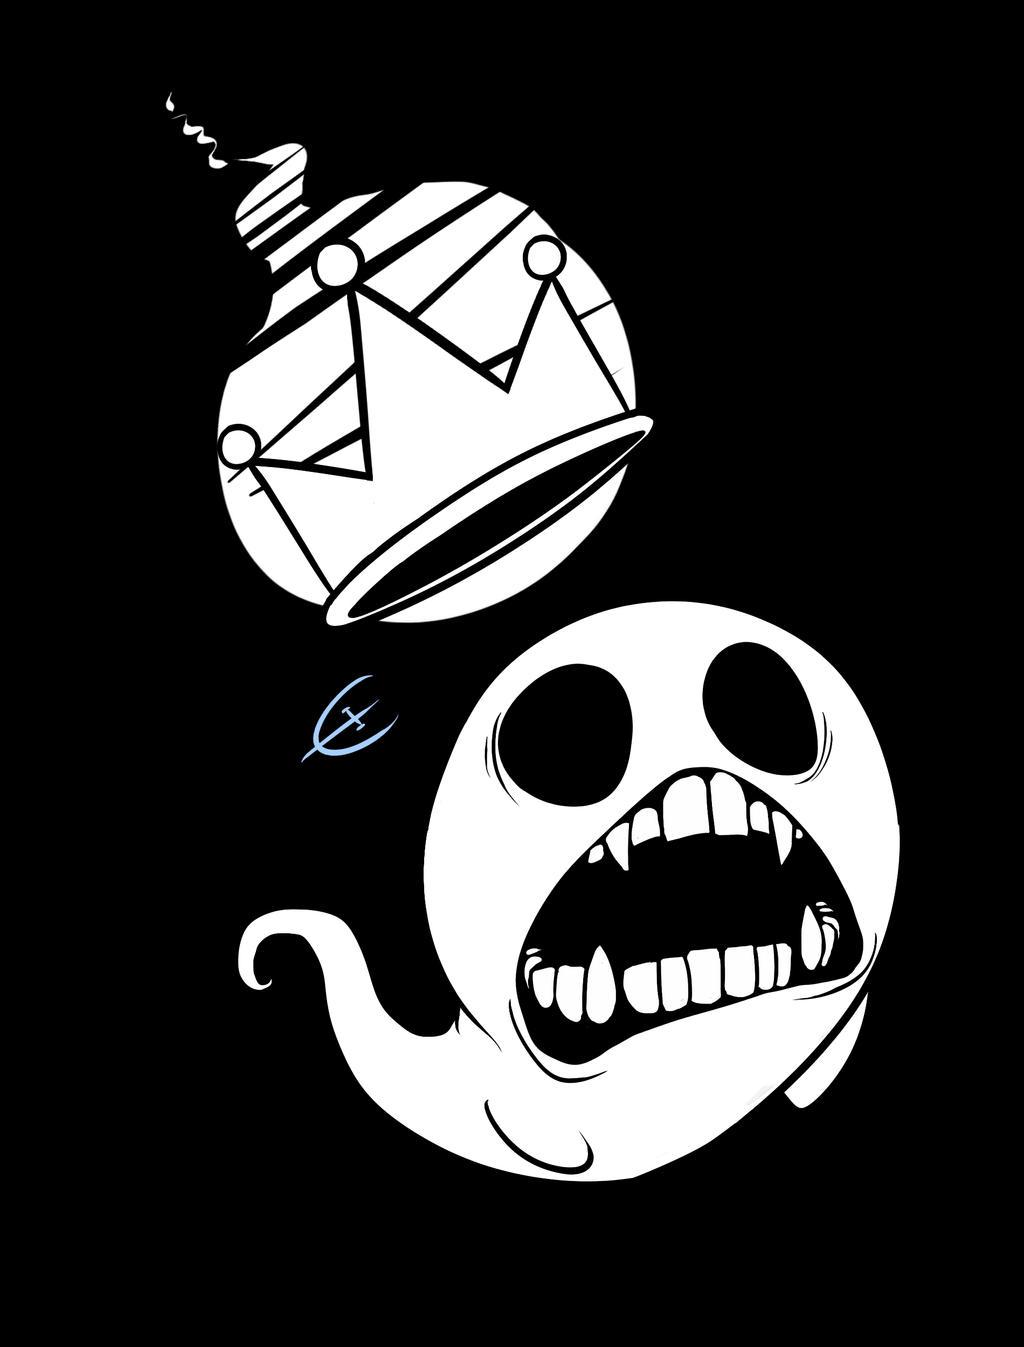 Ghost by efrejok